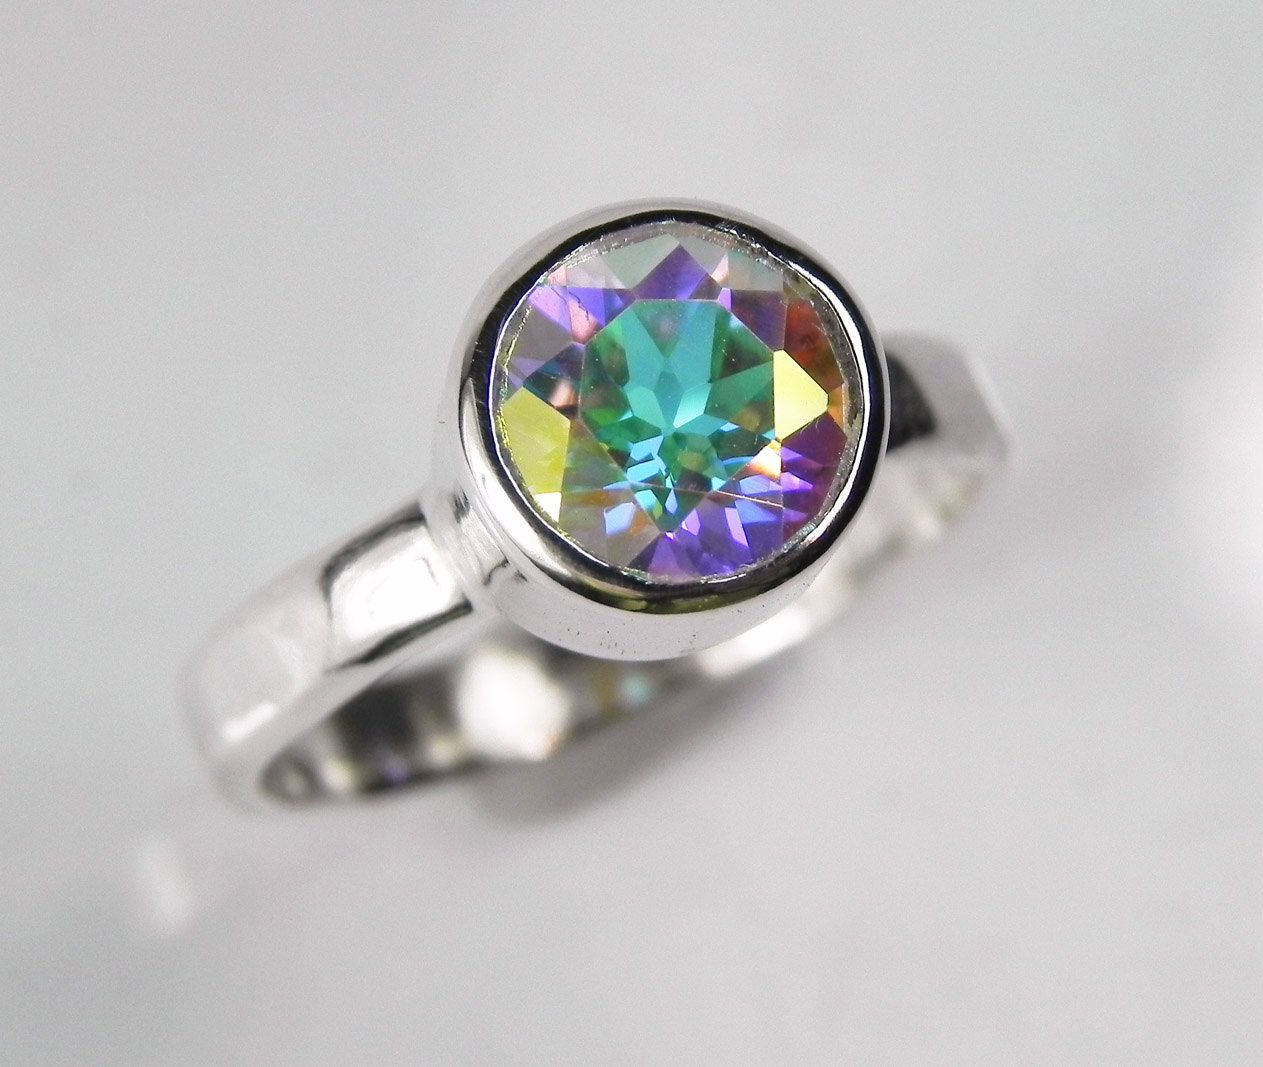 Mystic Topaz Engagement Ring -Rainbow